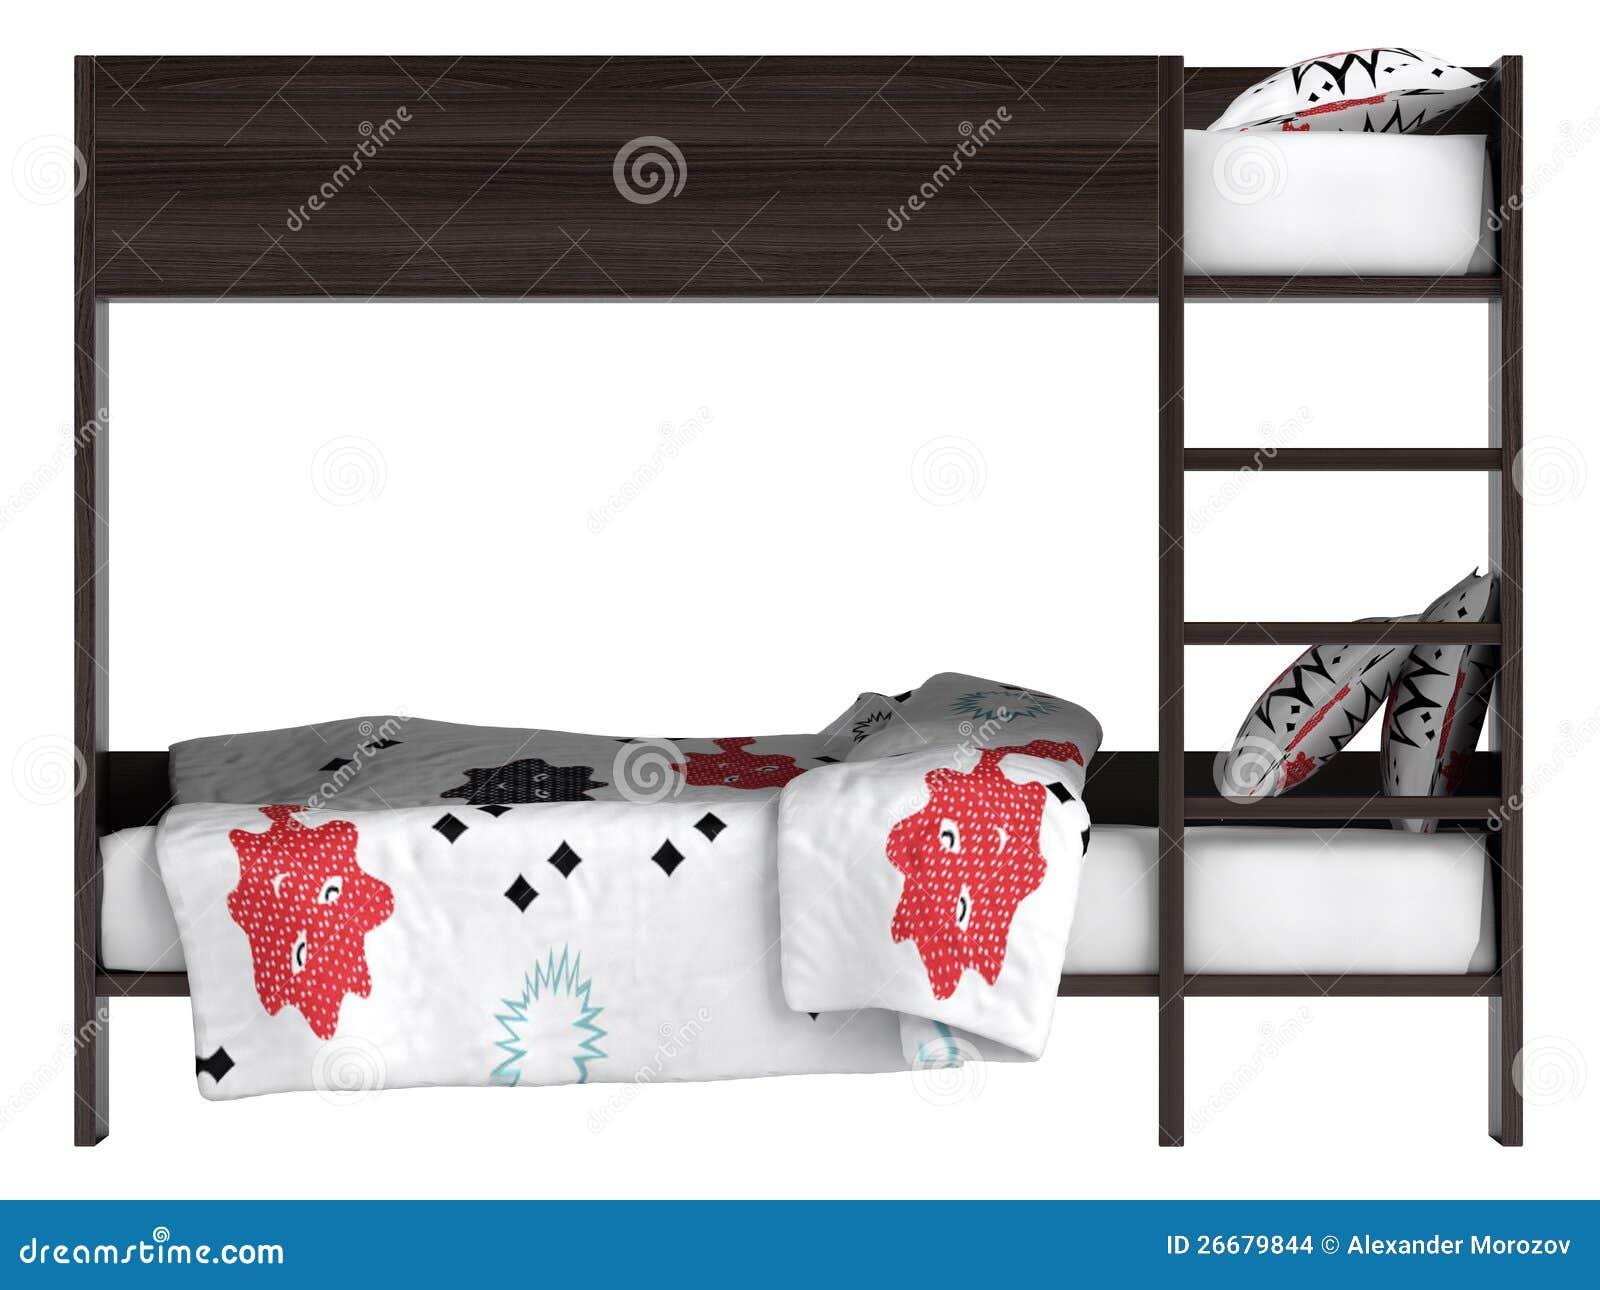 Modern Bunk Bed With Bedding Stock Illustration Illustration Of Climb Bedroom 26679844